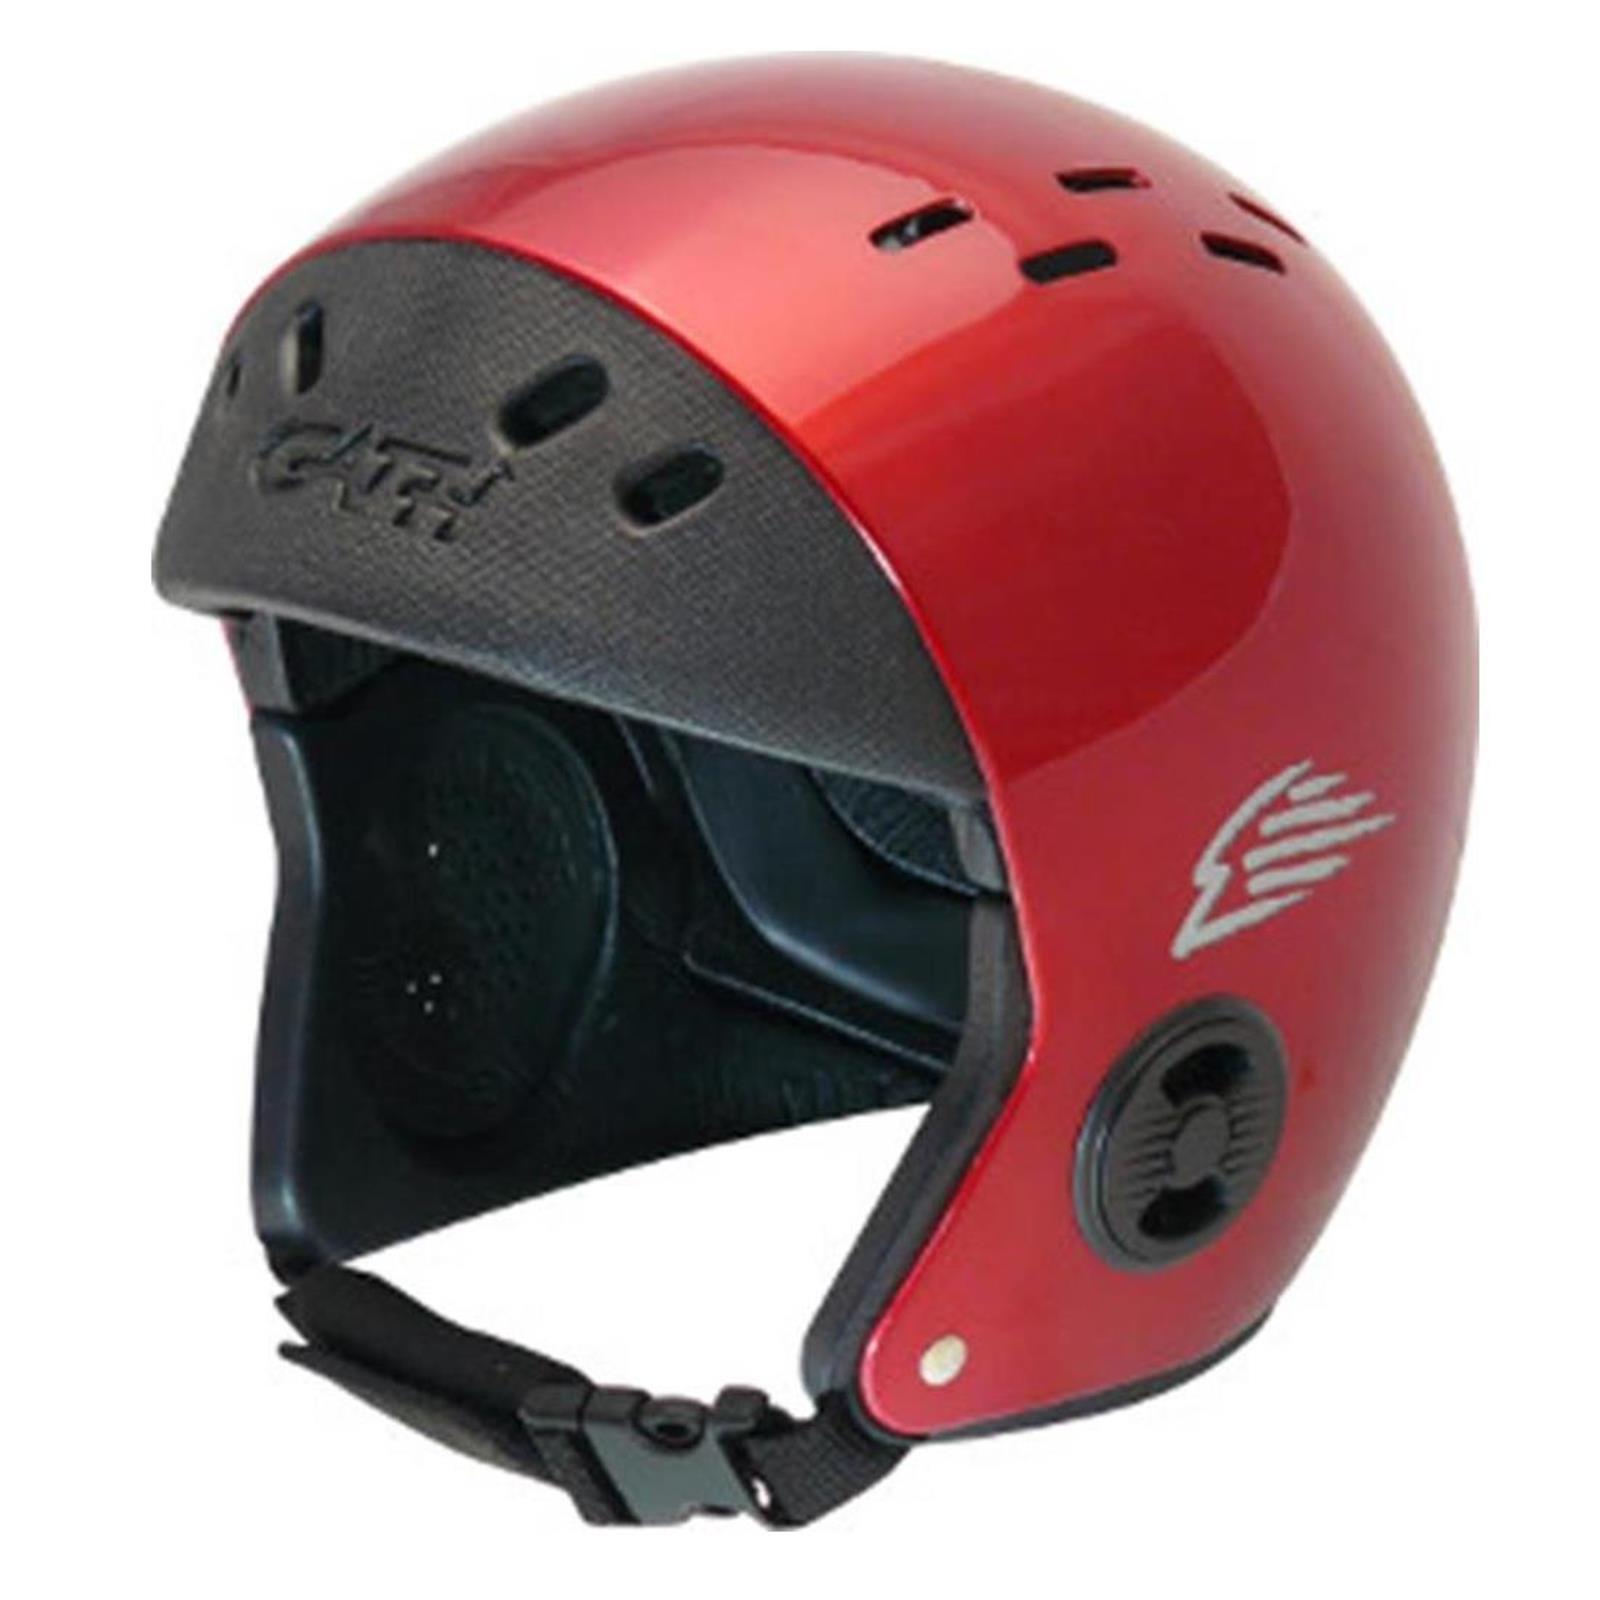 Gath deportes acuáticos casco casco casco estándar s safety rojo gloss, rojo windsurf, kite, Wake 5e3cd7